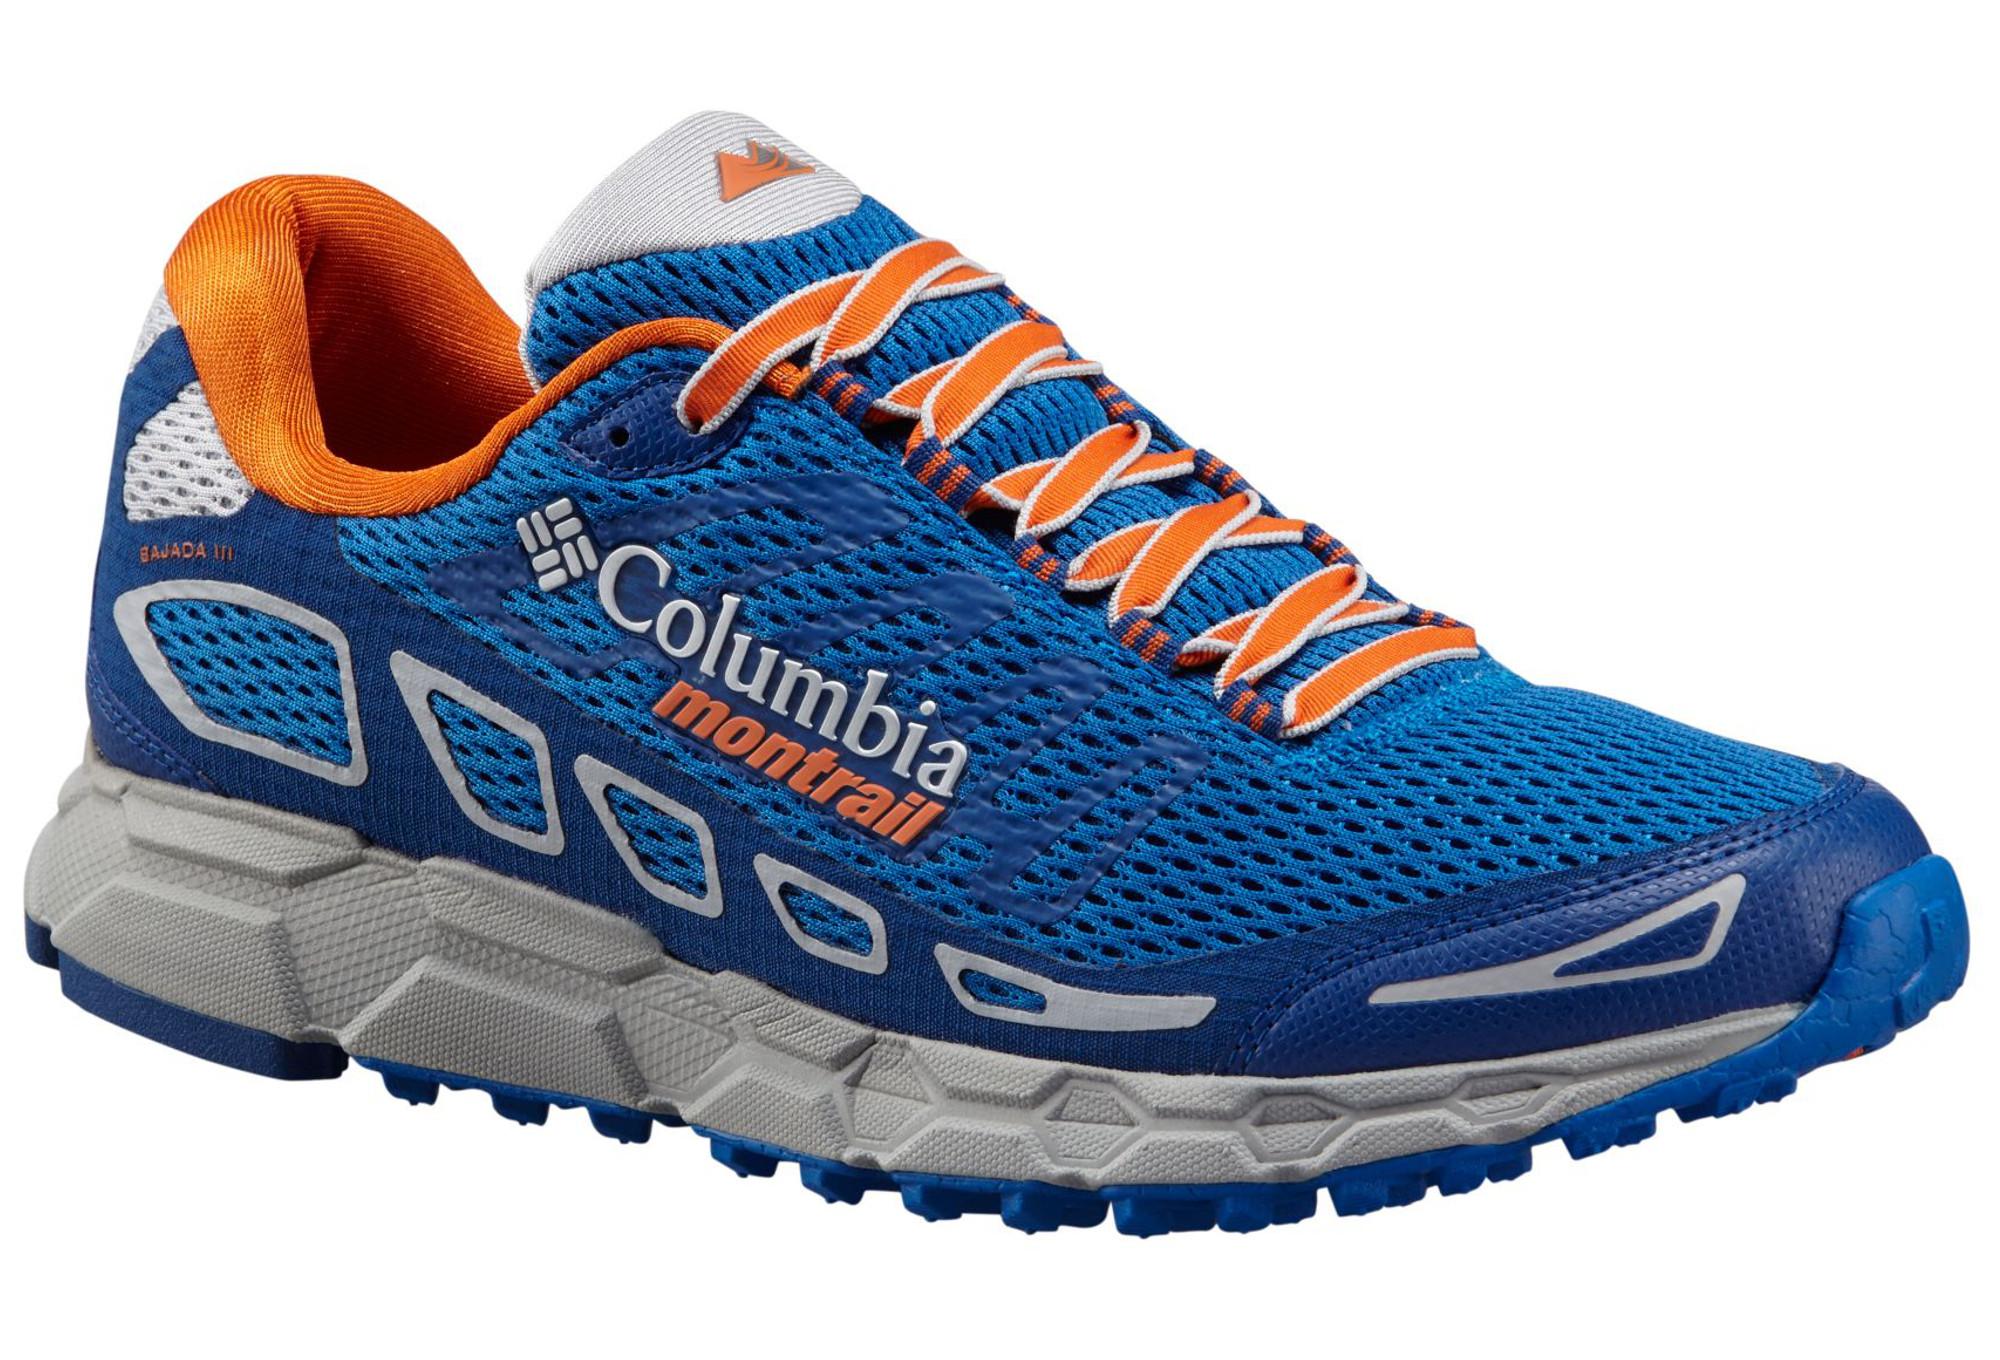 chaussures de trail columbia bajada iii bleu orange. Black Bedroom Furniture Sets. Home Design Ideas